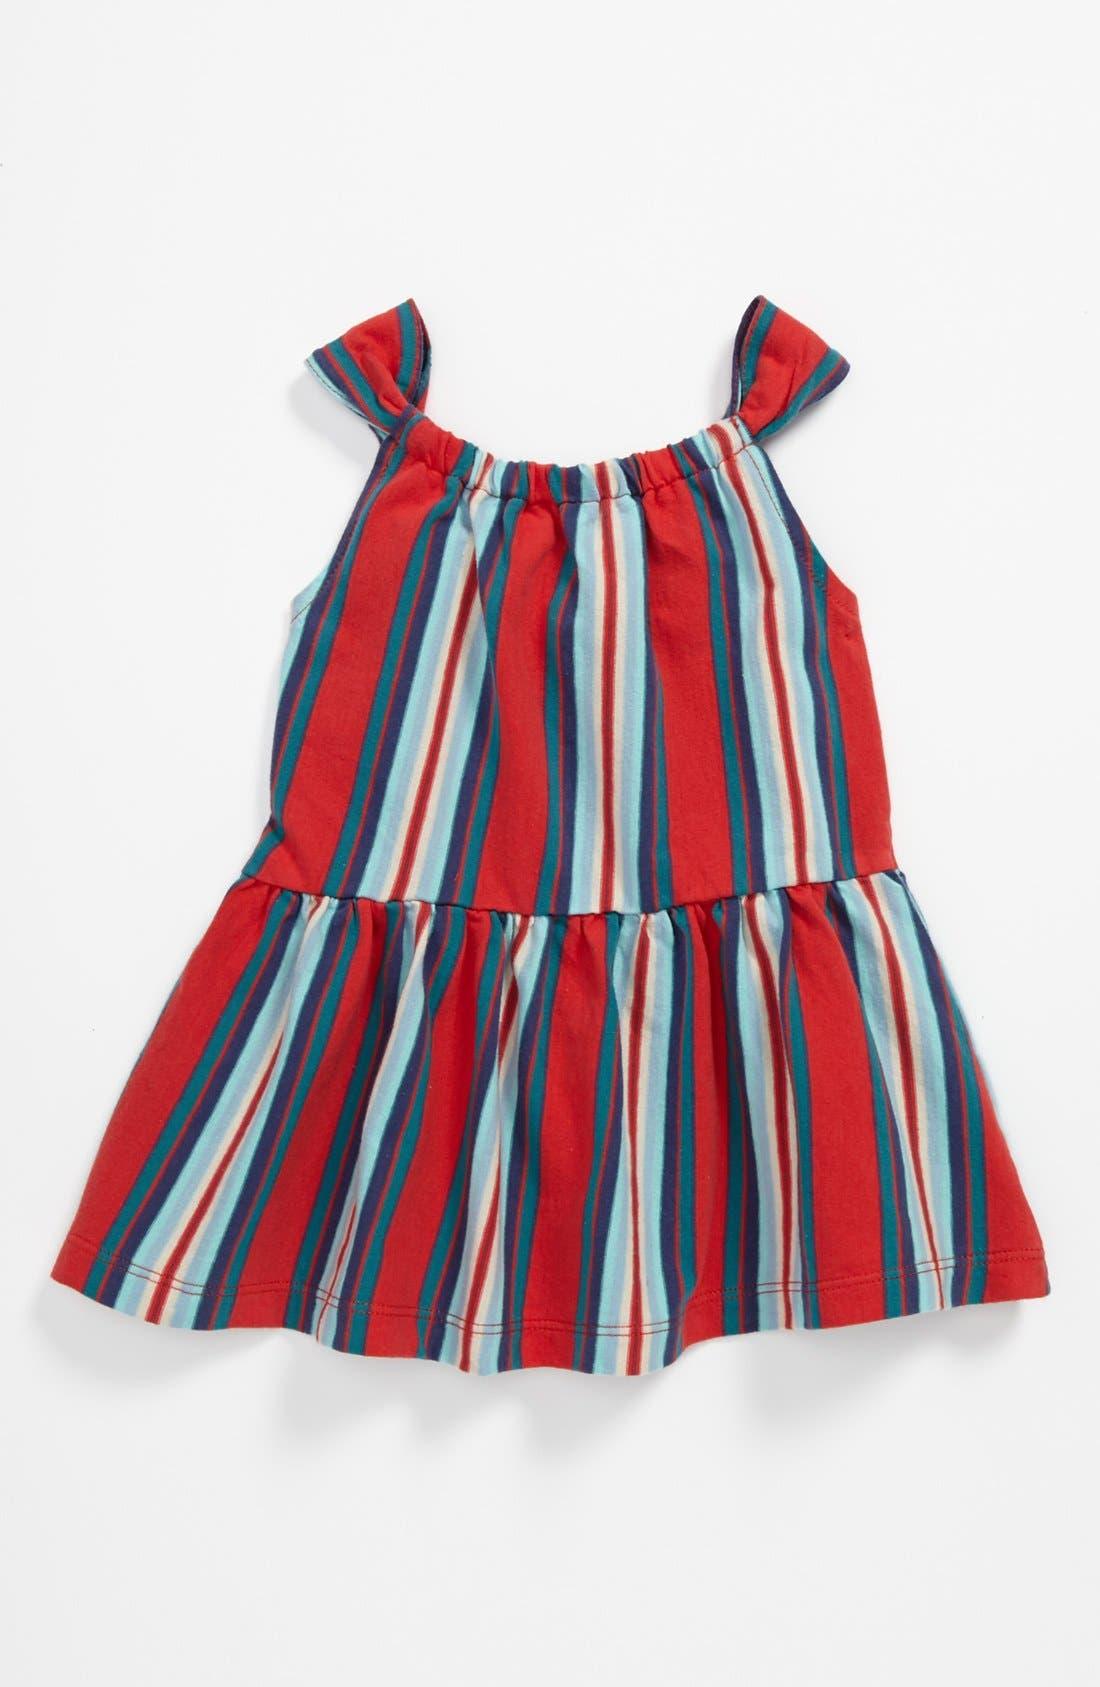 Main Image - Tea Collection 'Venda' Top (Little Girls & Big Girls)